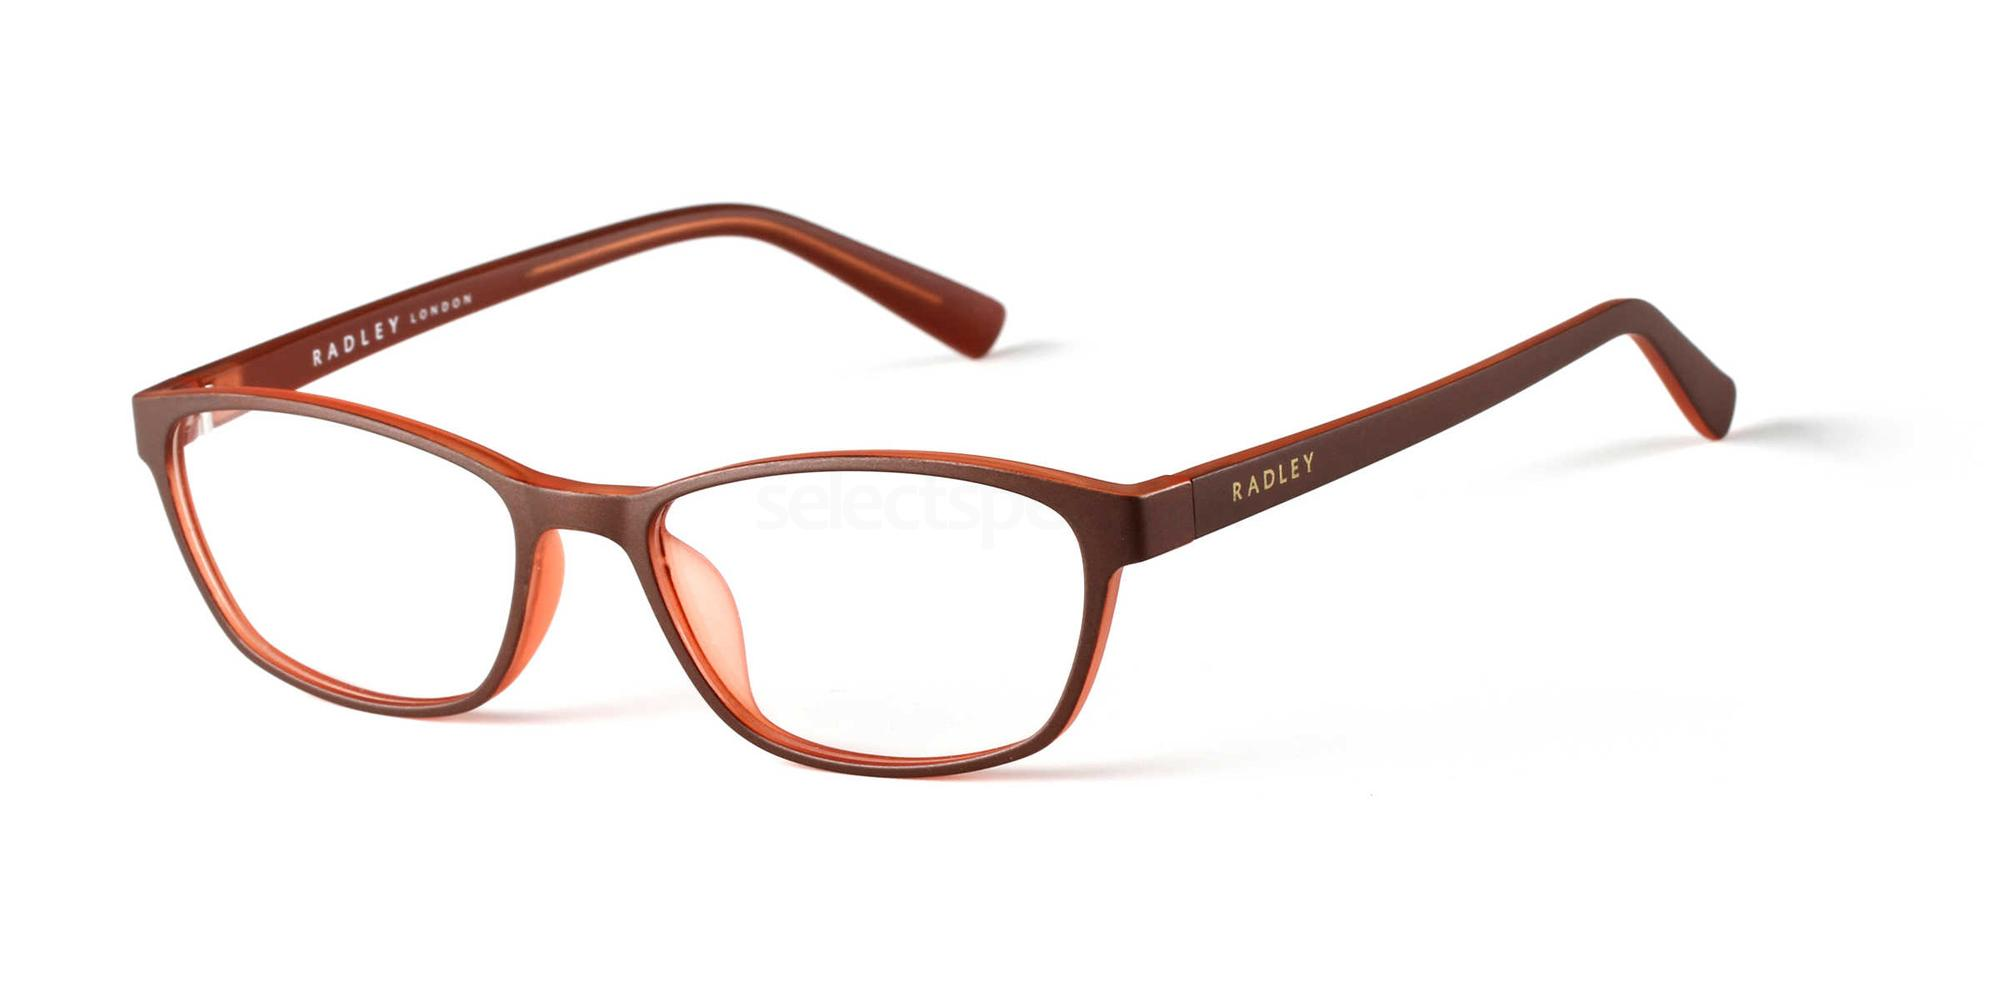 101 RDO-15504 Glasses, Radley London